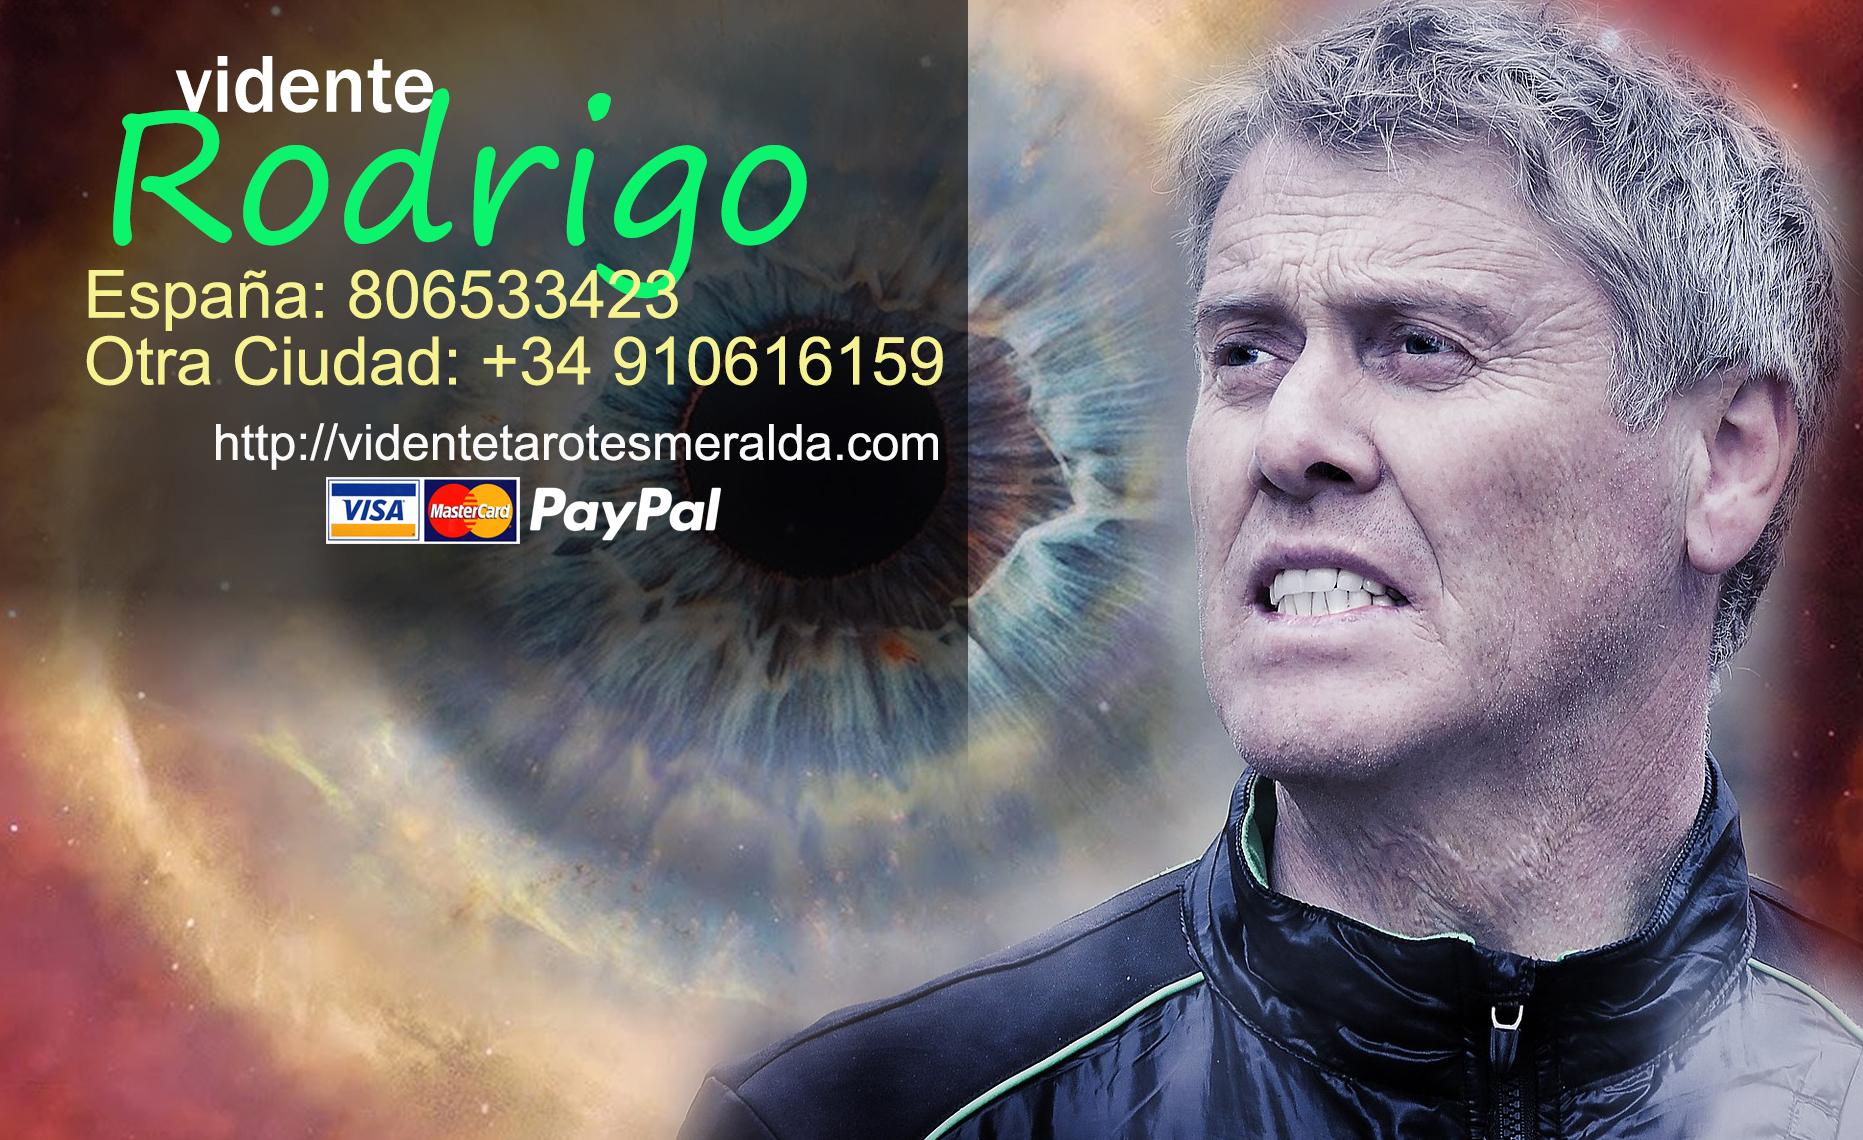 Vidente Rodrigo